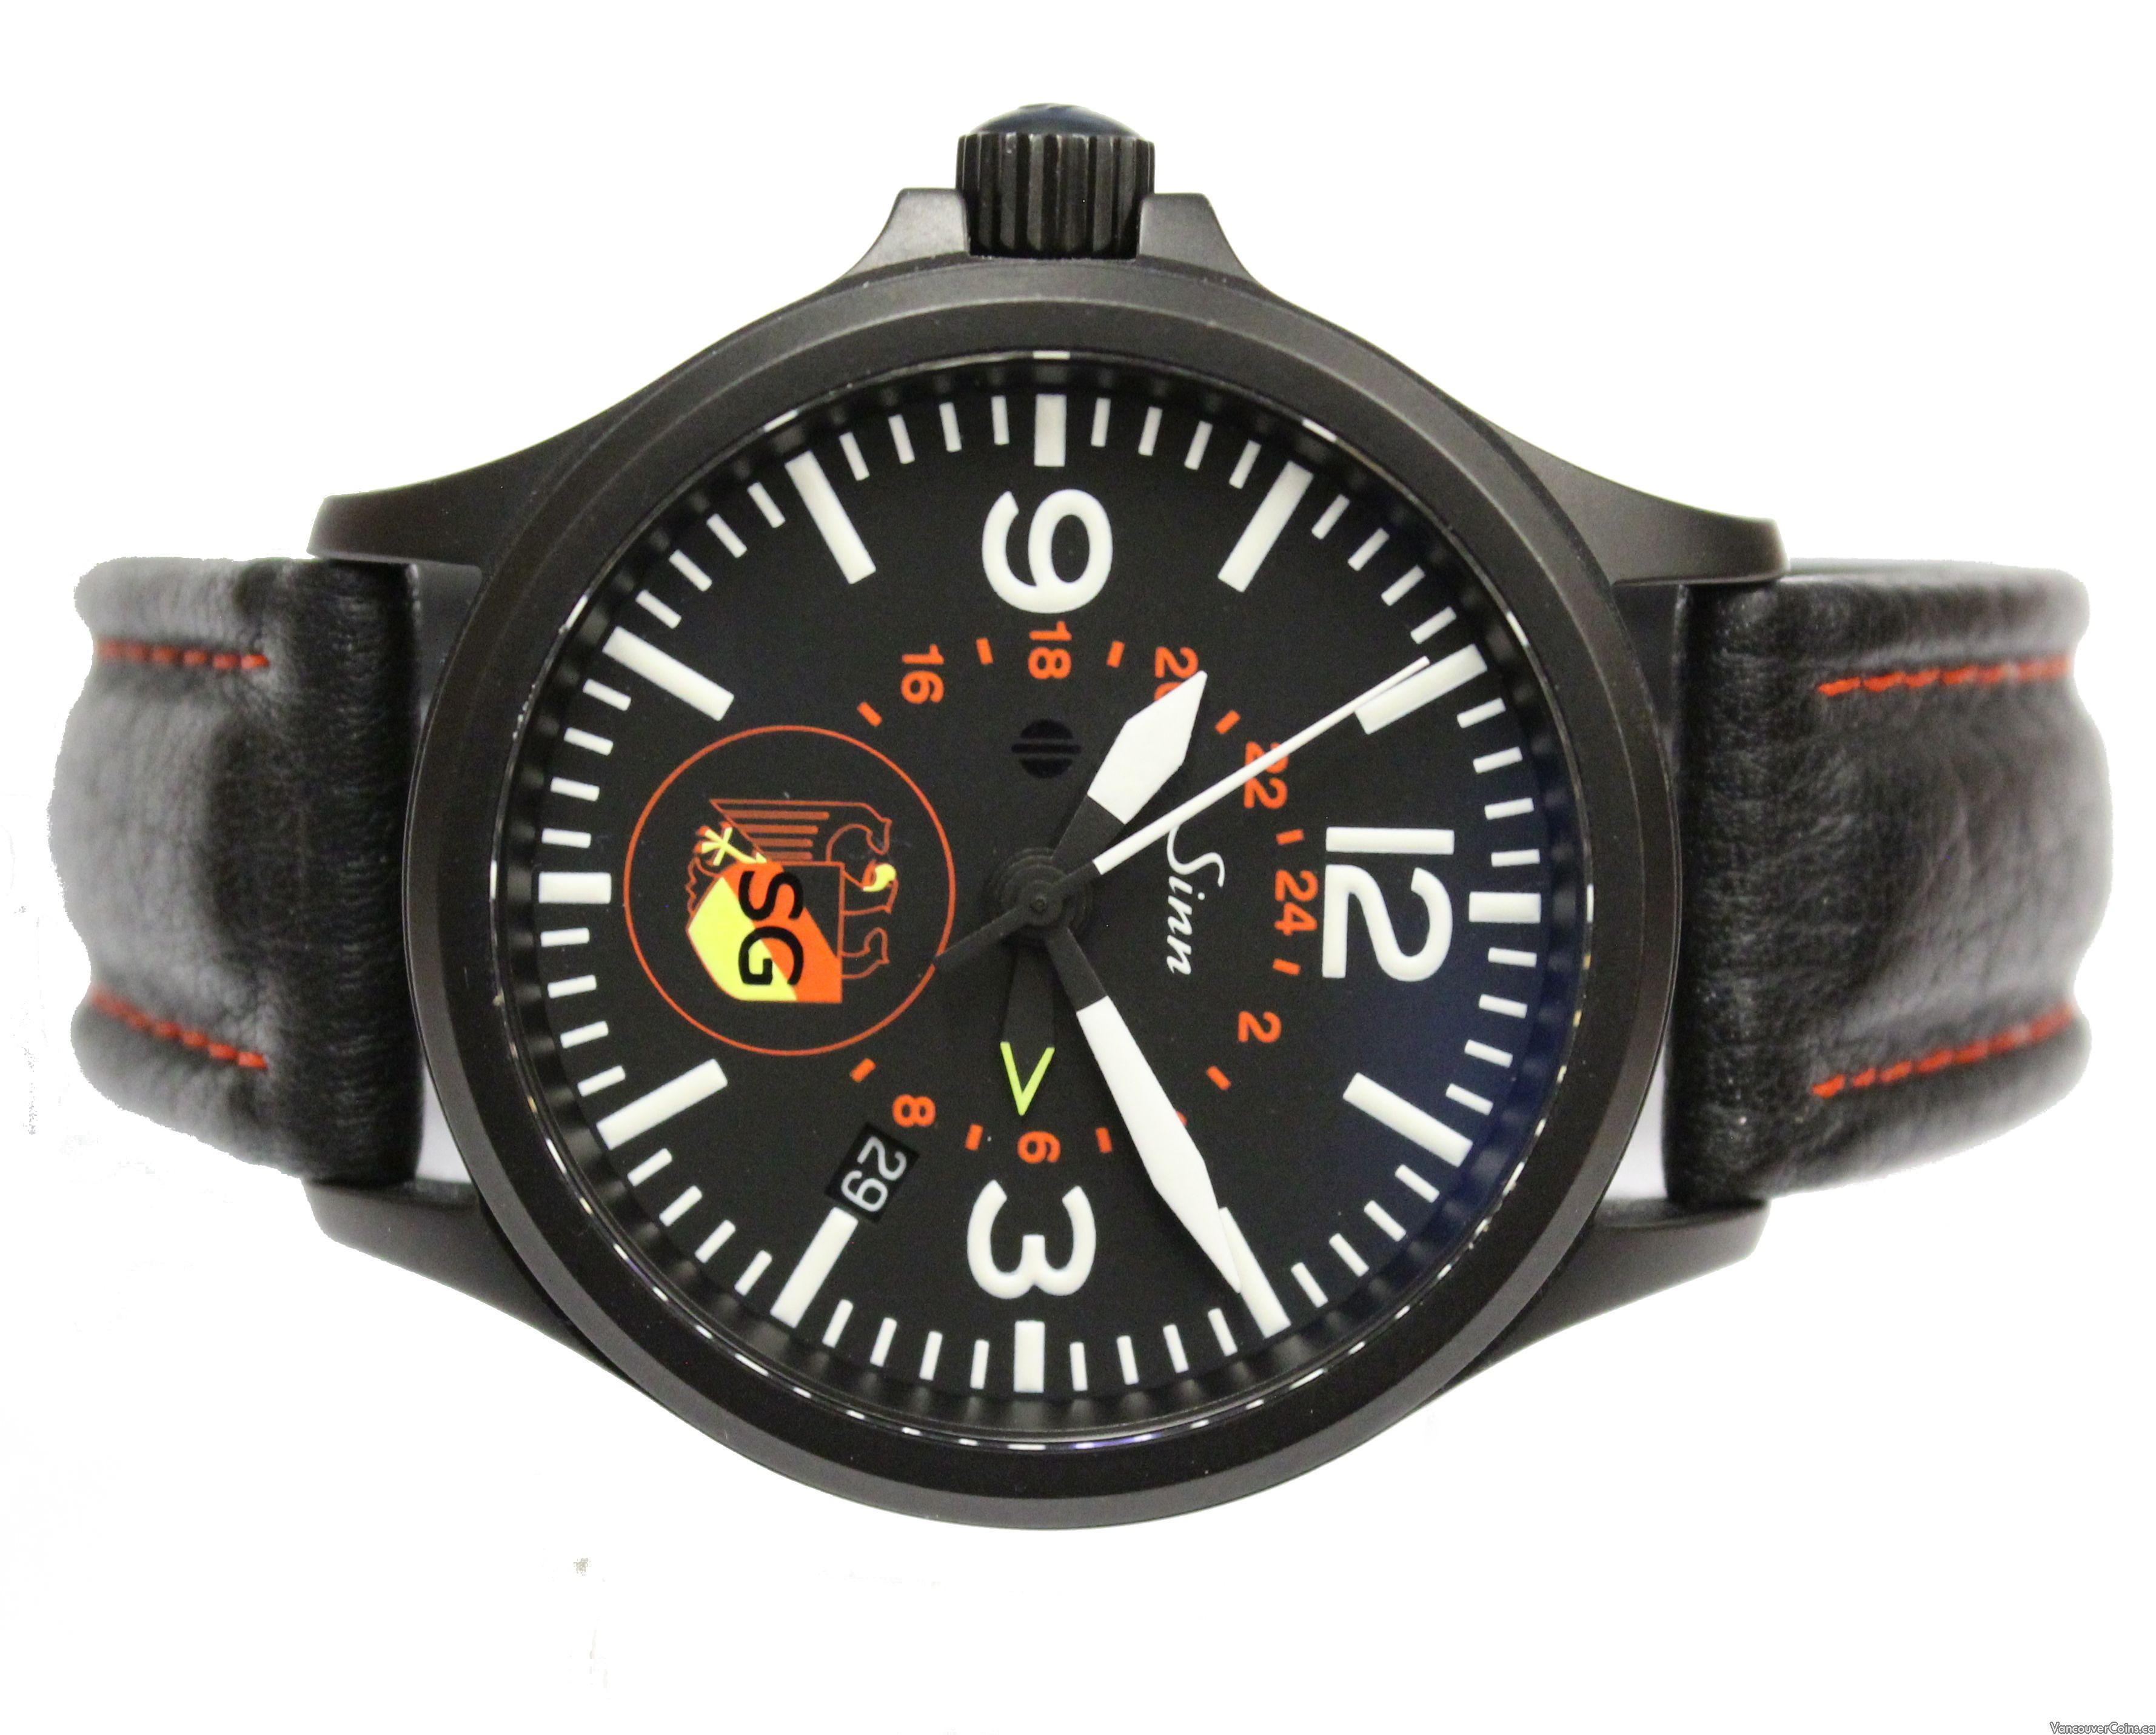 Sinn 856 S BKA/SG UTC Automatic Left Hand Watch